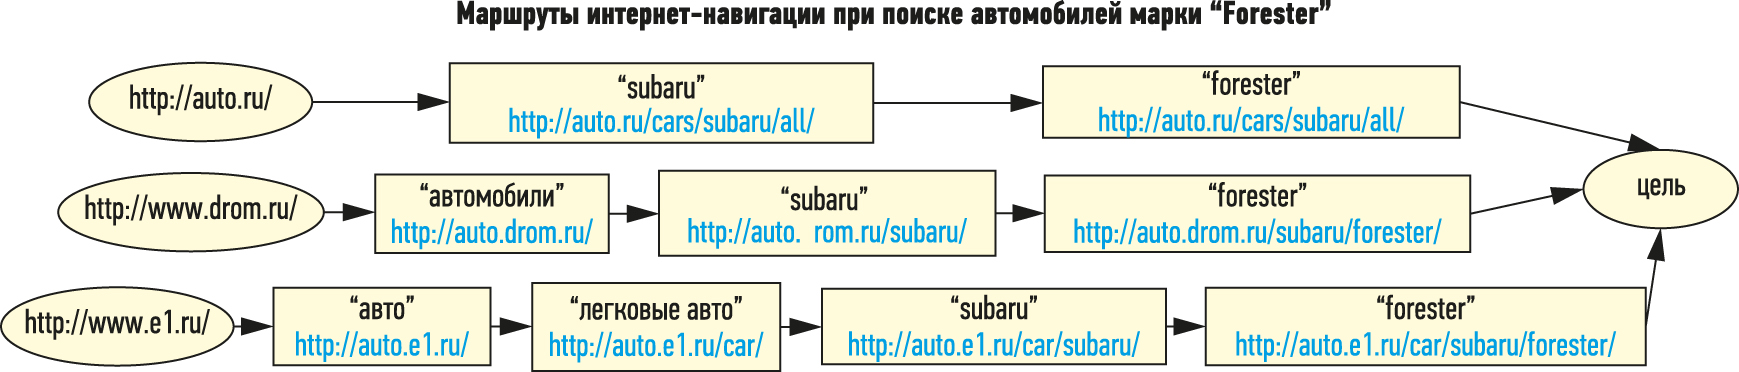 программные агенты